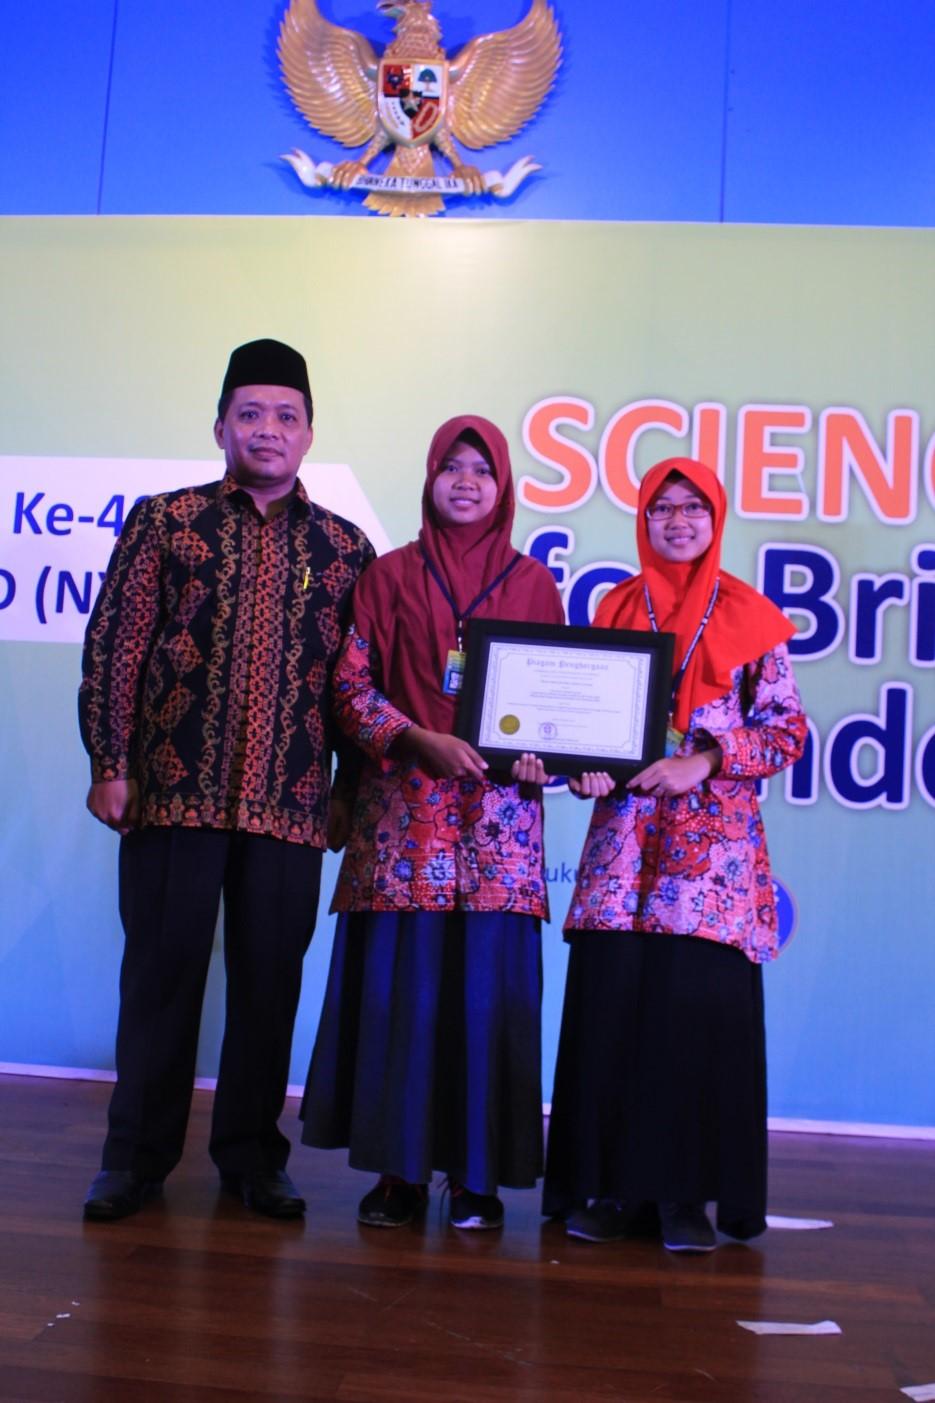 MAN 2 Kudus dan MAN 1 Cilacap Raih Special Award dari LIPI